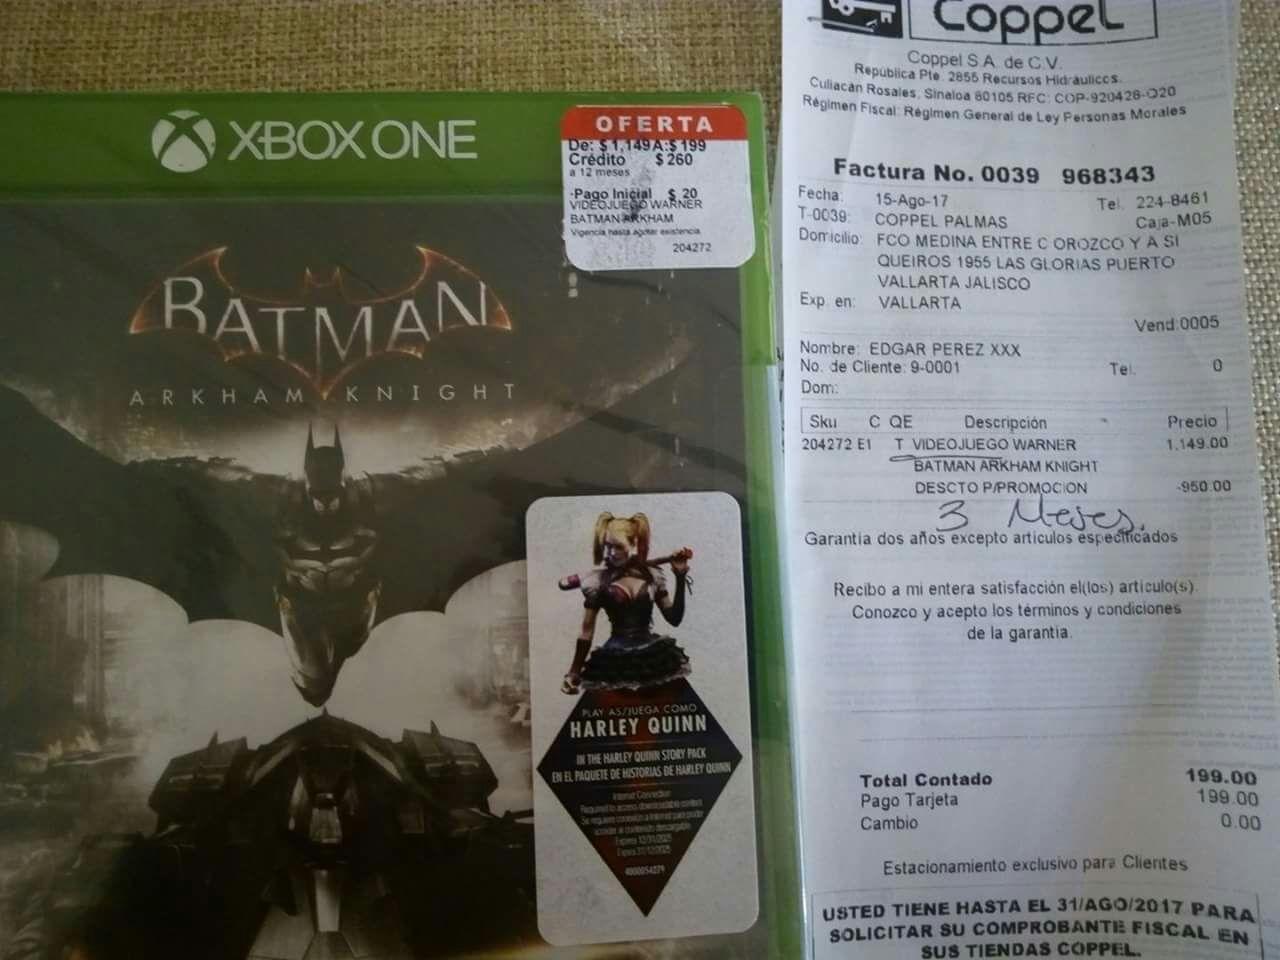 Coppel: Batman arkham knight